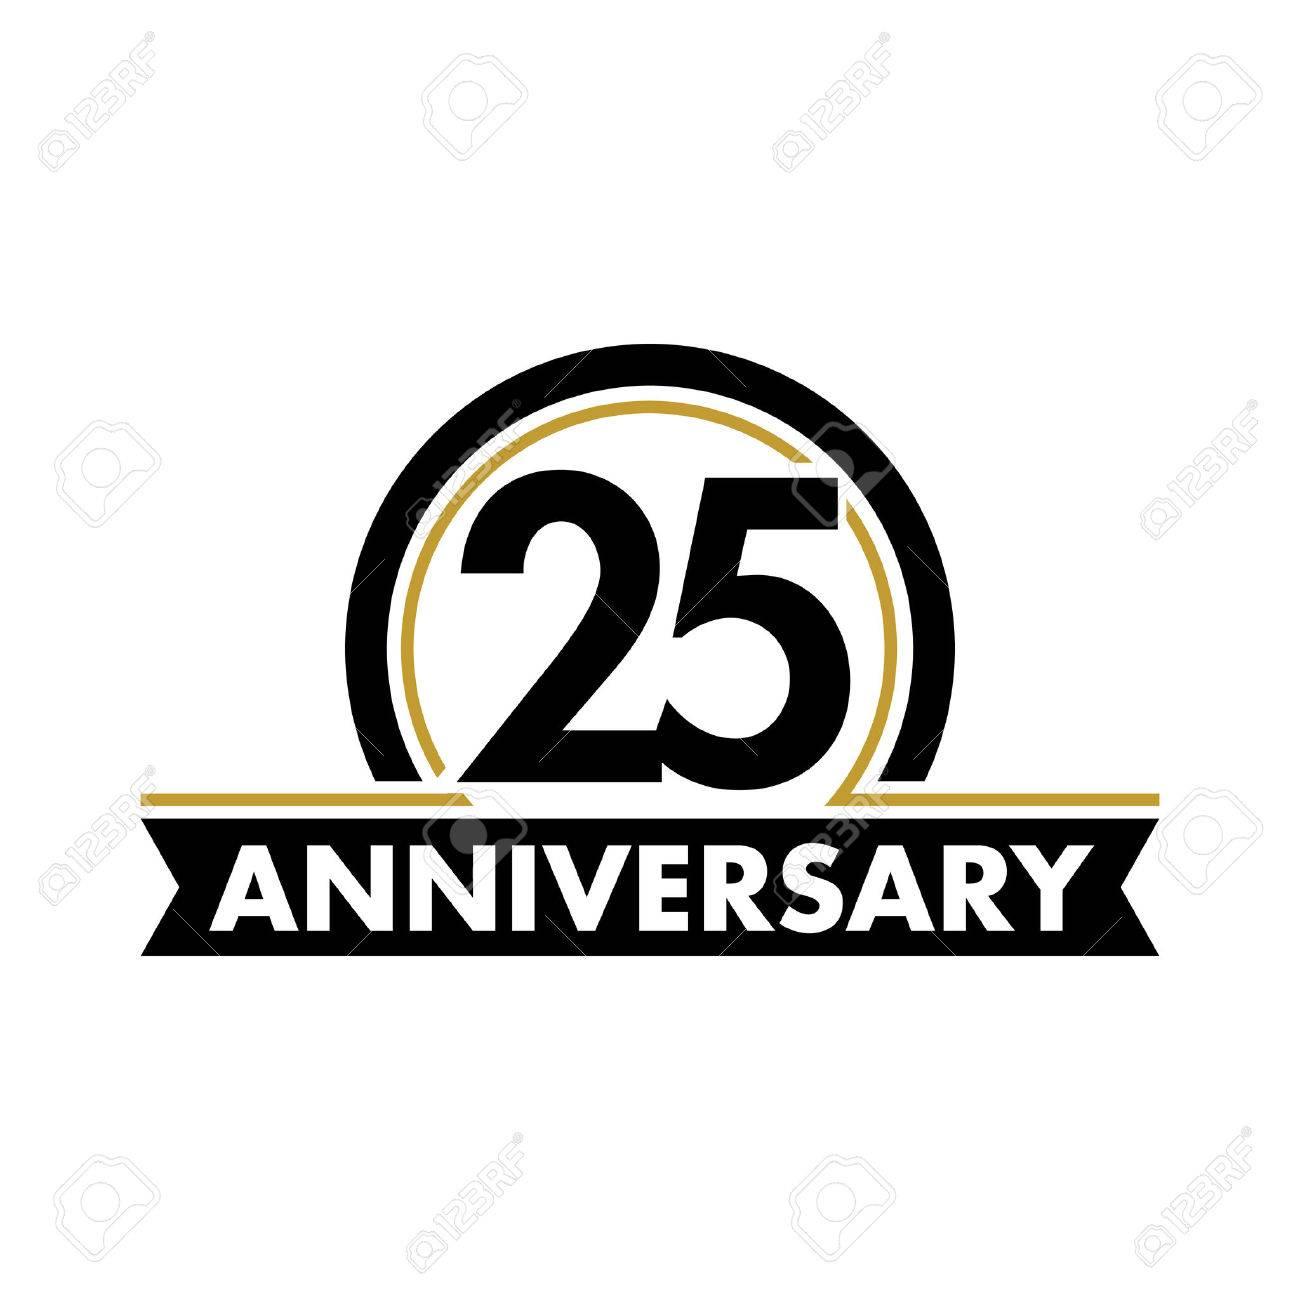 anniversary vector unusual label twenty fifth anniversary symbol rh 123rf com 25 years logo vector free 25 years logo ideas